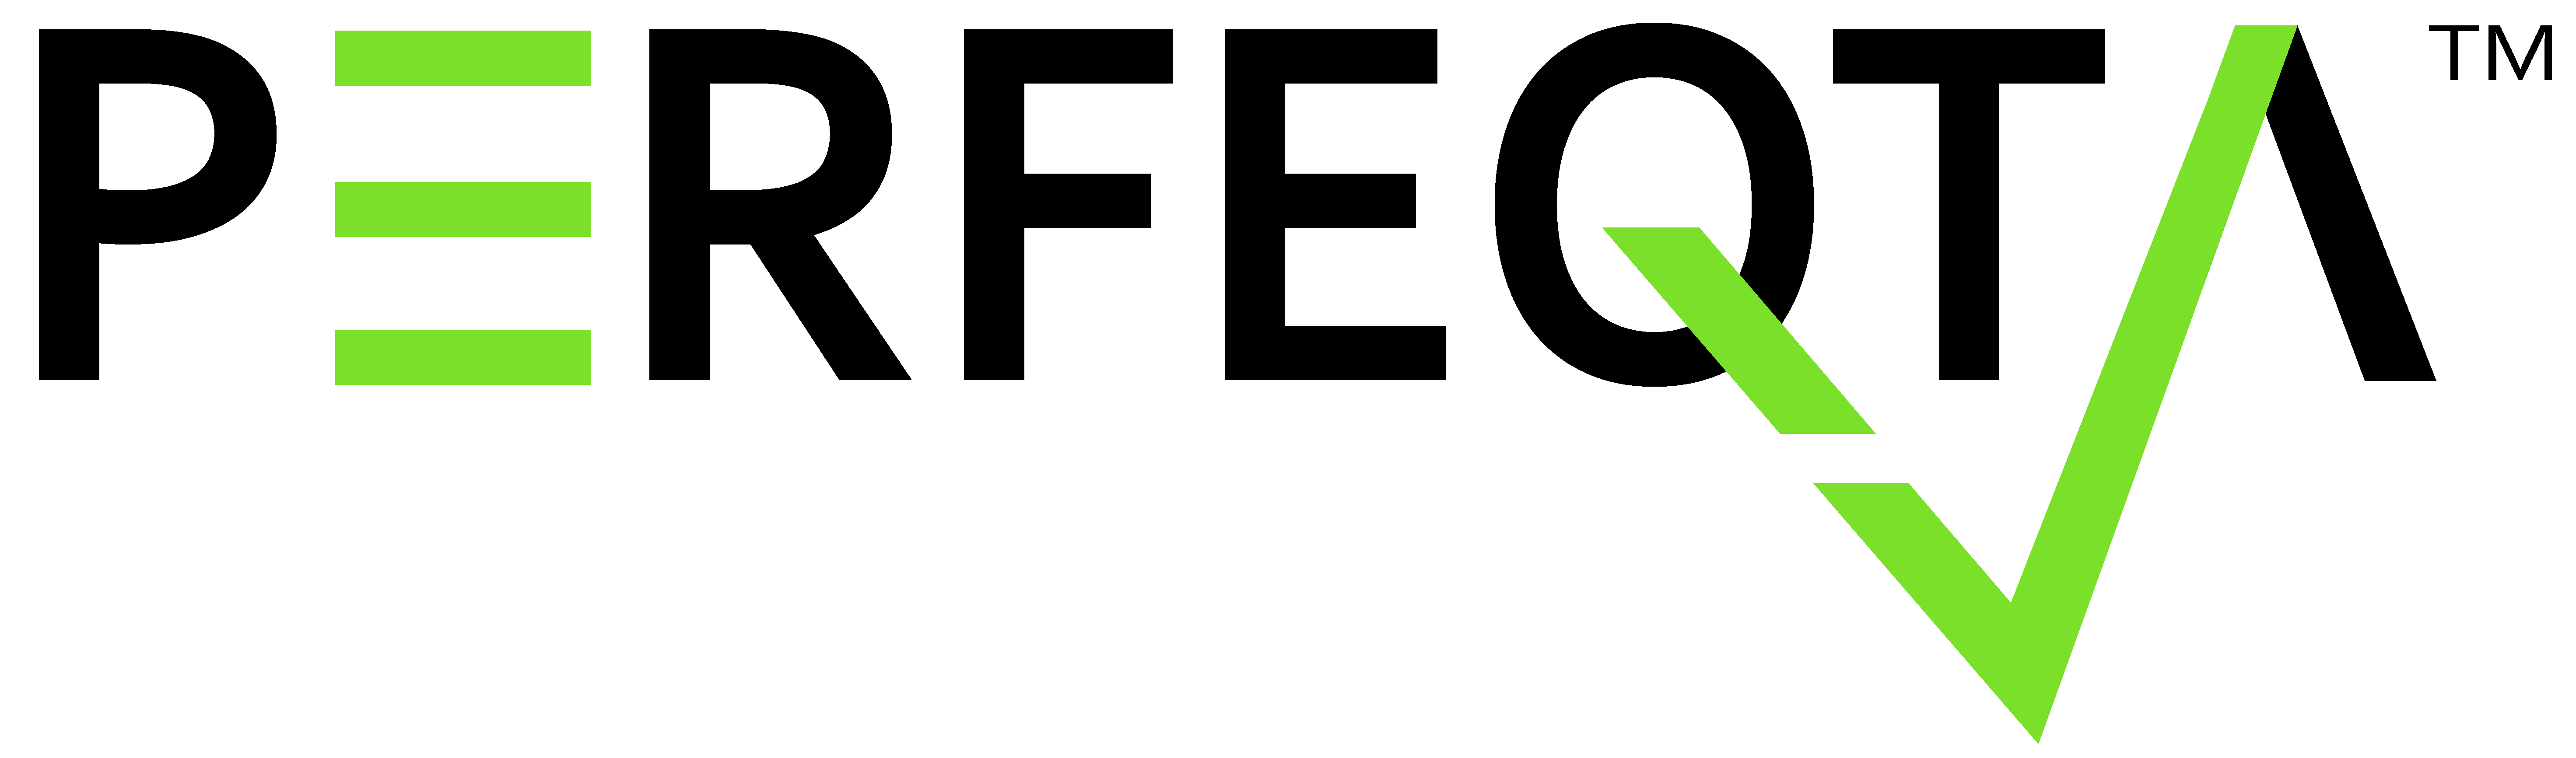 PERFEQTA logo